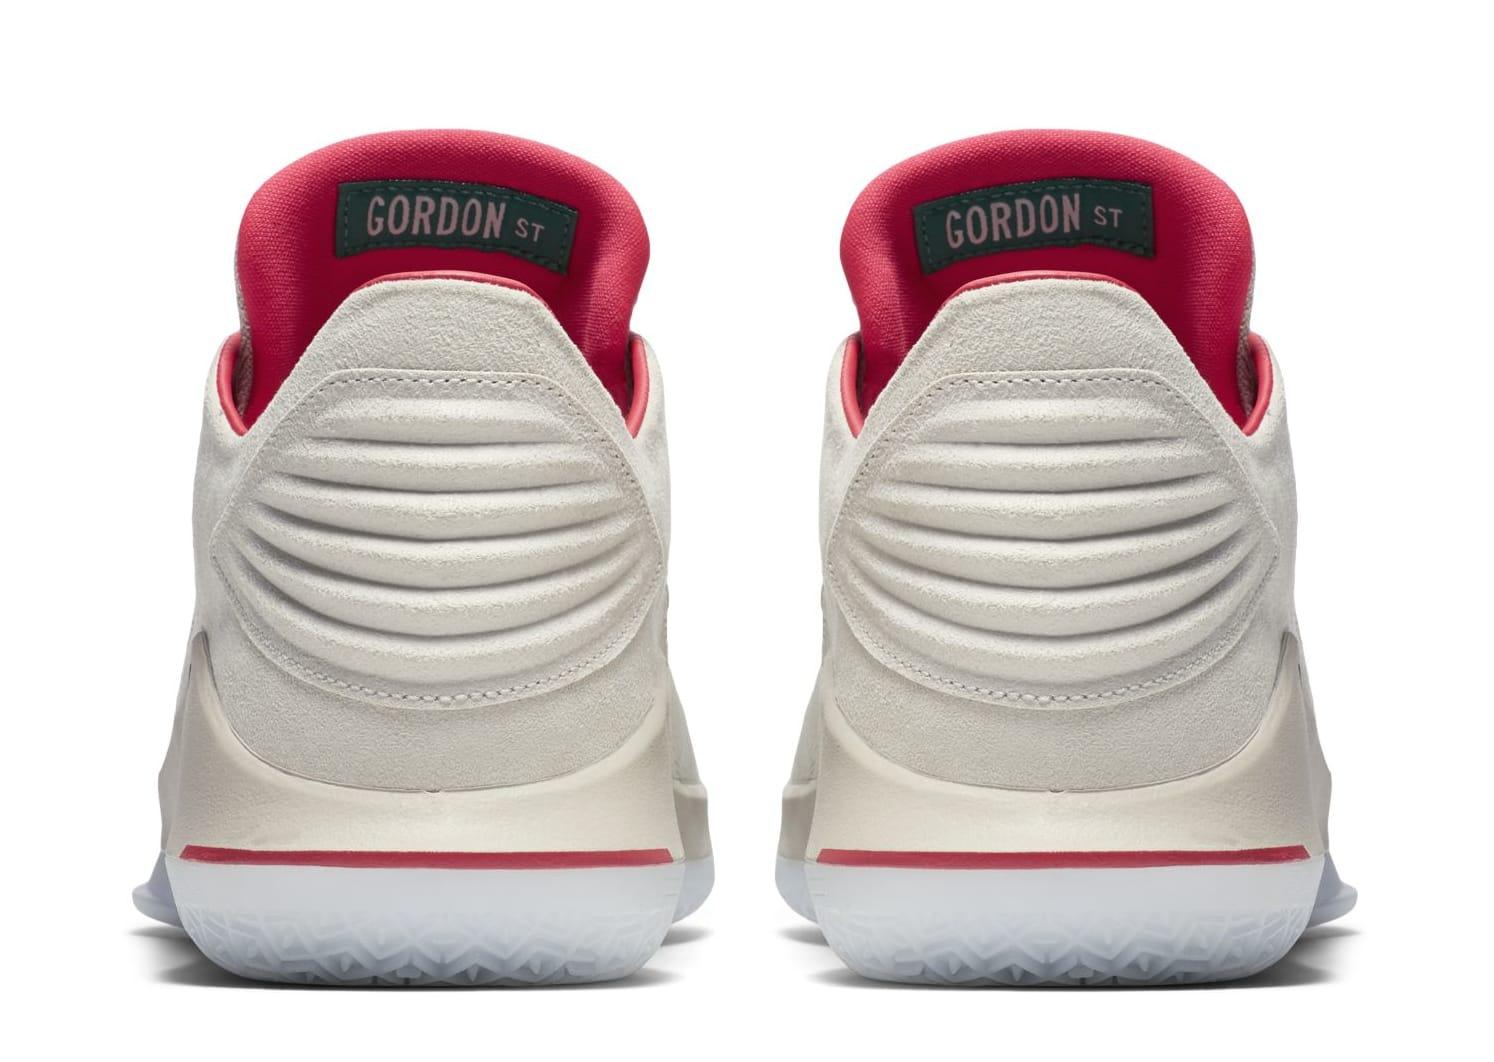 Air Jordan 32 Low 'Gordon St.' (Heel)